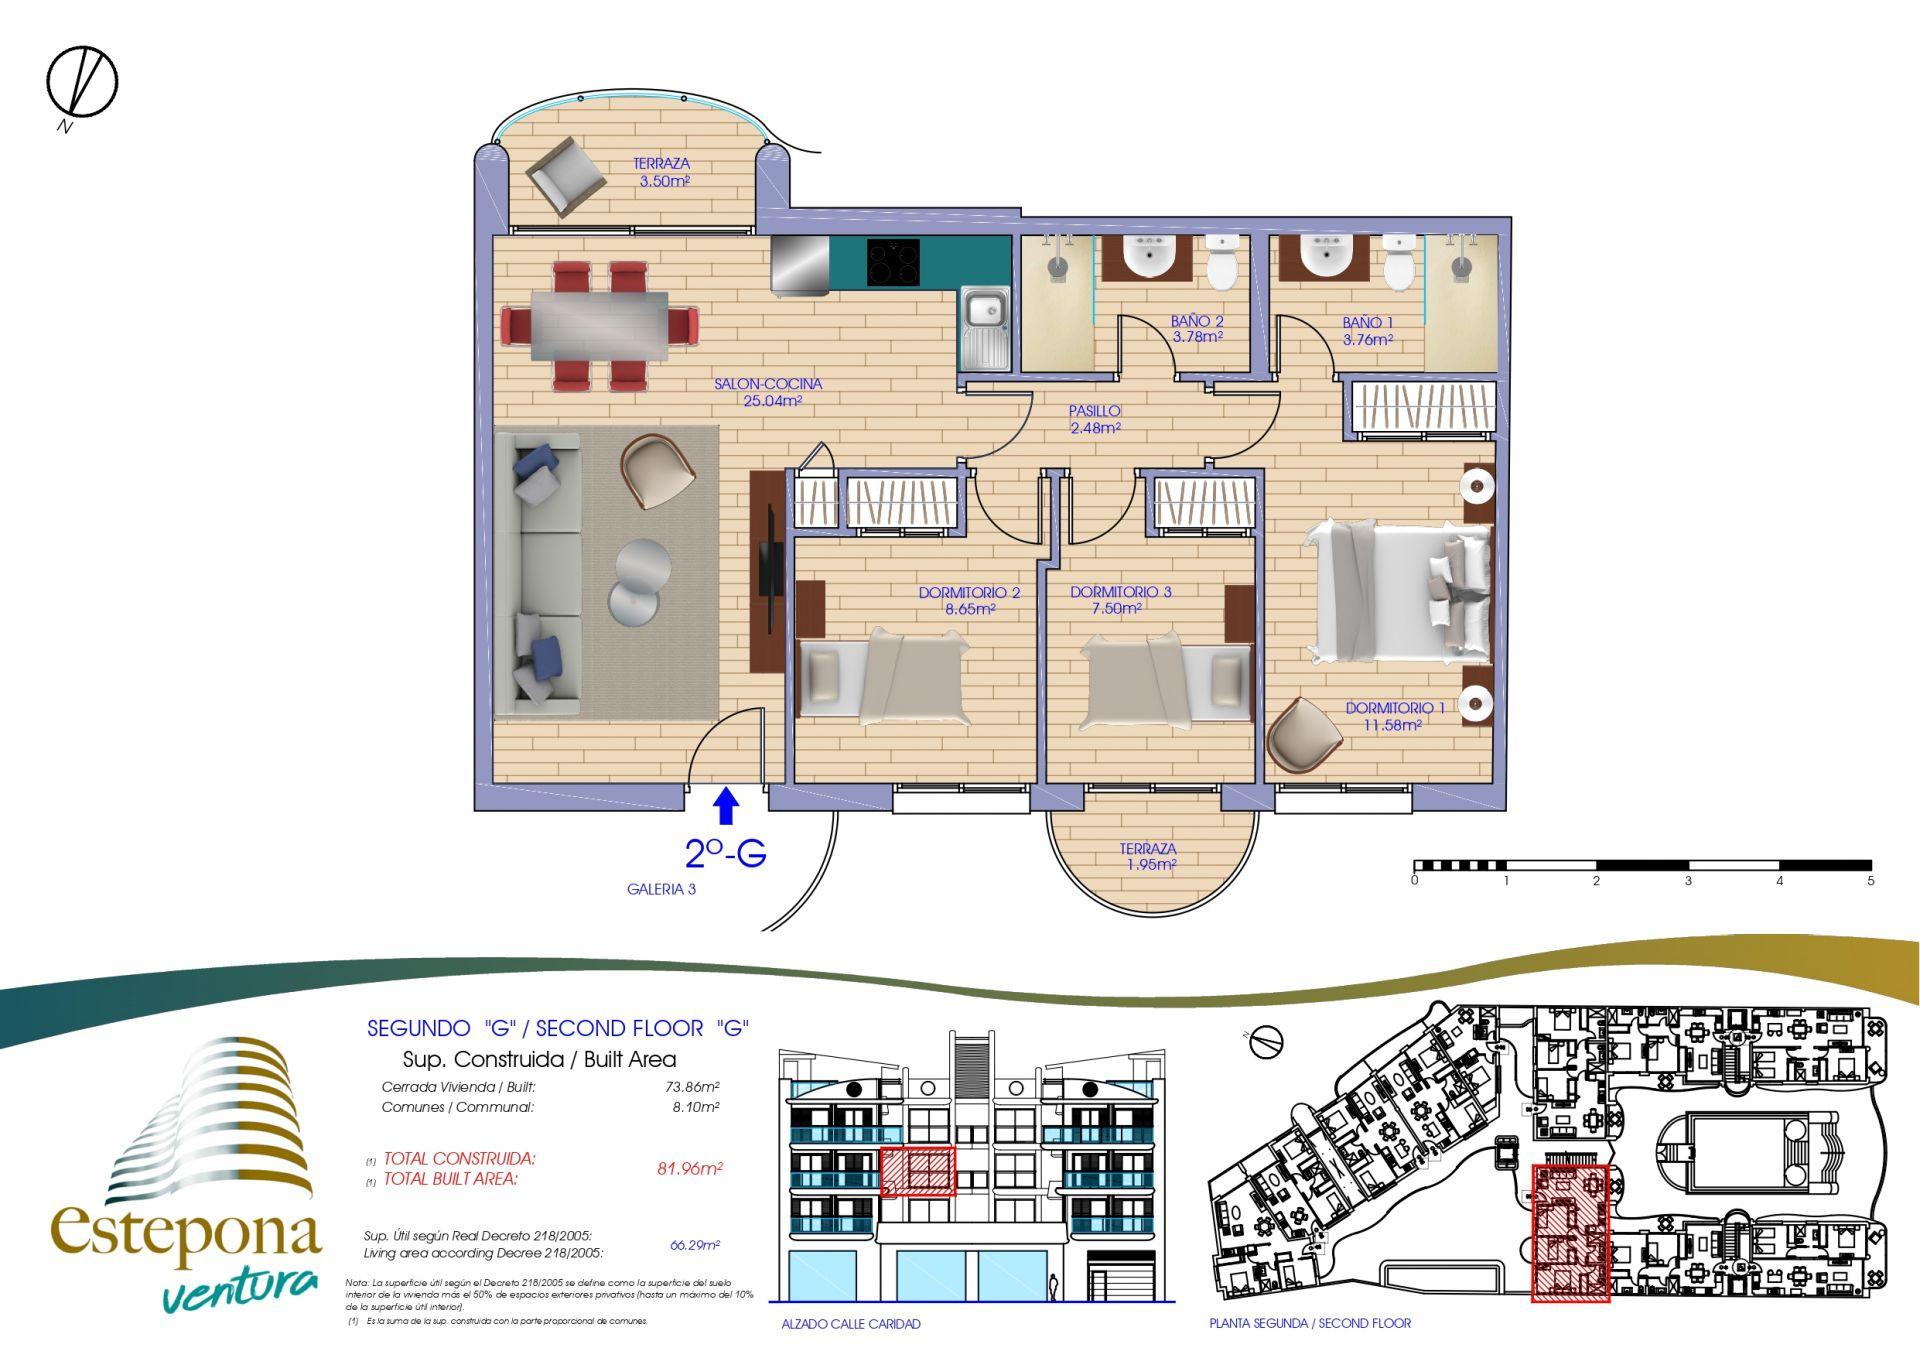 2g - Ventura Estepona | Compra de casa en Estepona